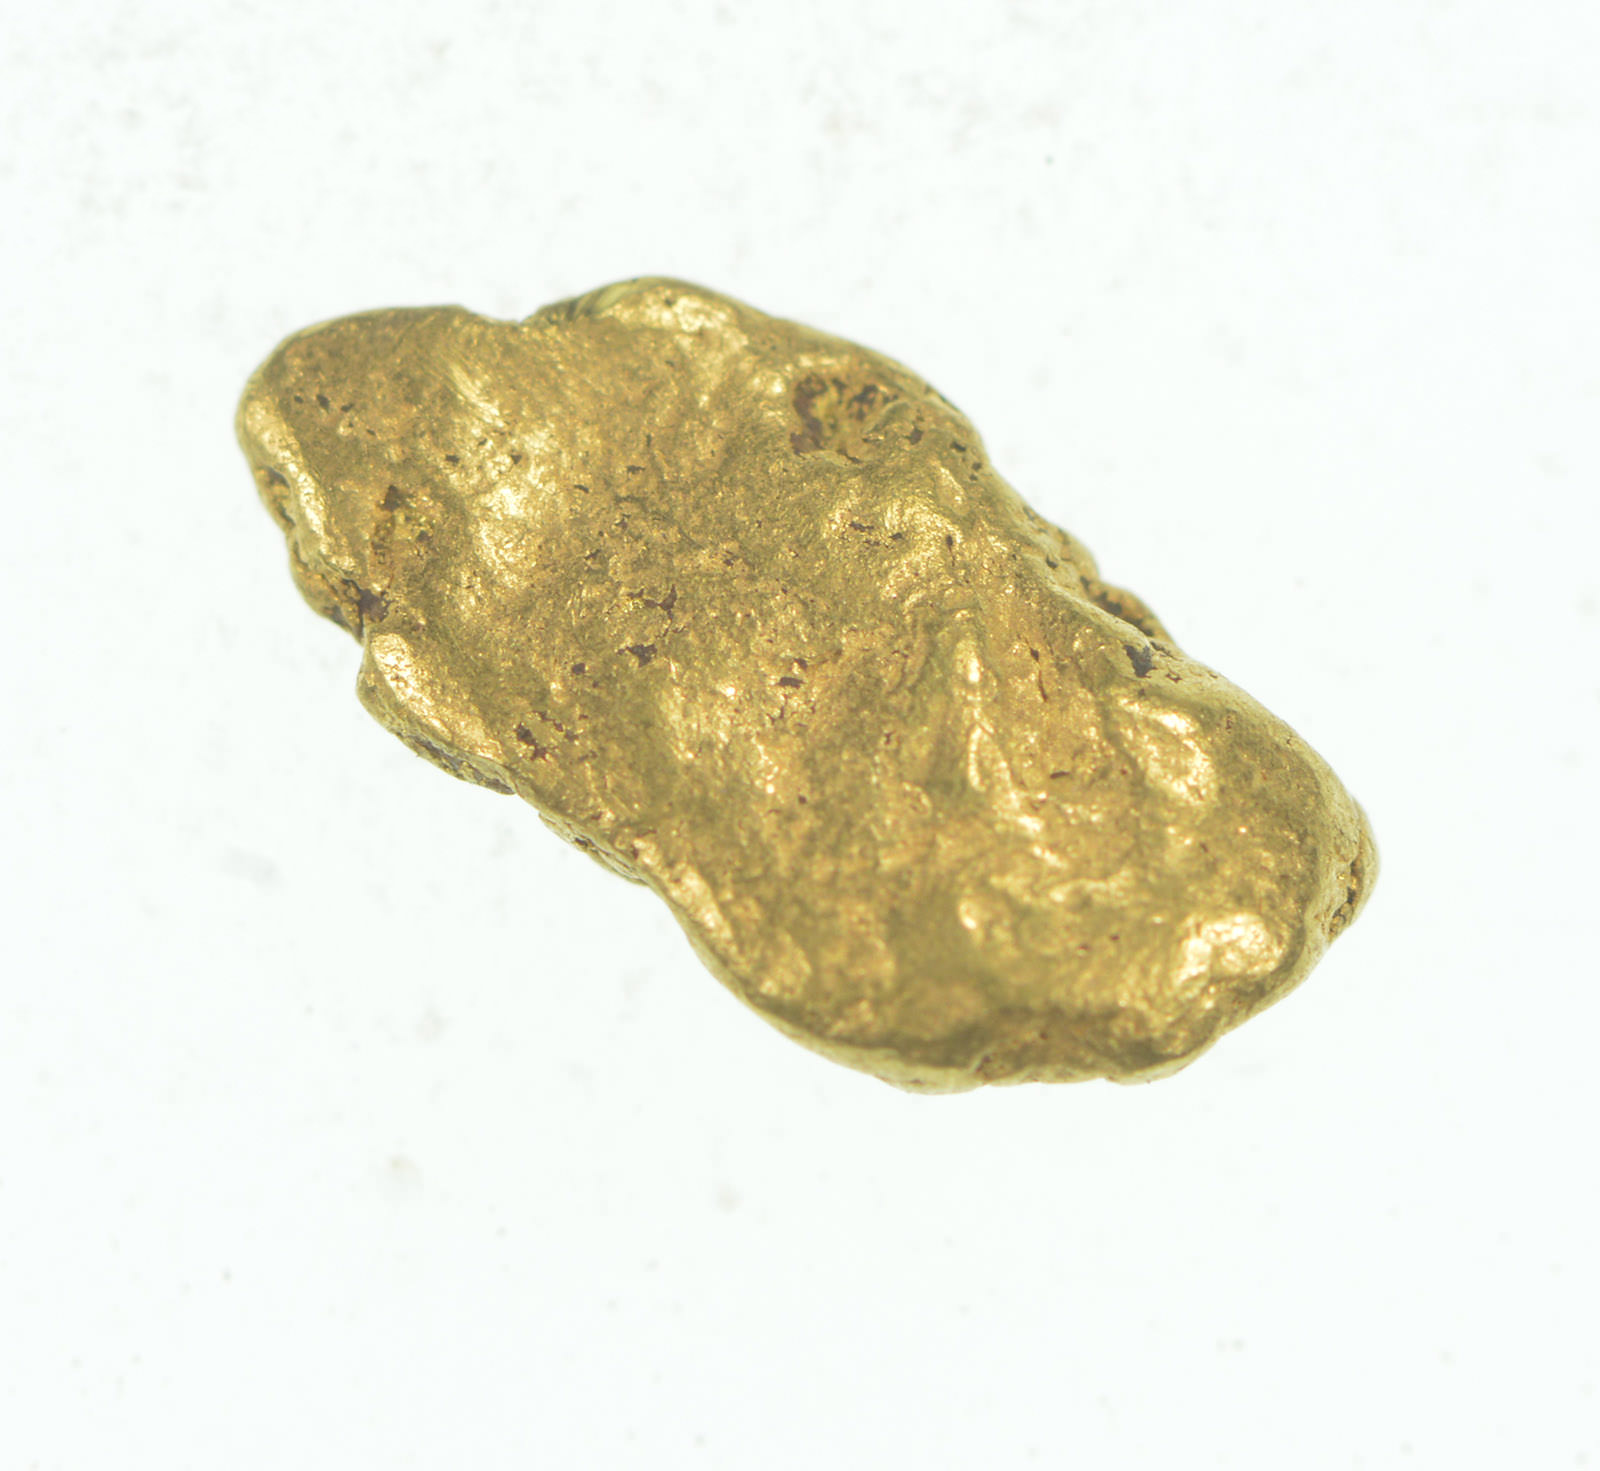 Gold Rush - Idaho Gold Nugget - Raw High Karat - 0 7g Original Gold